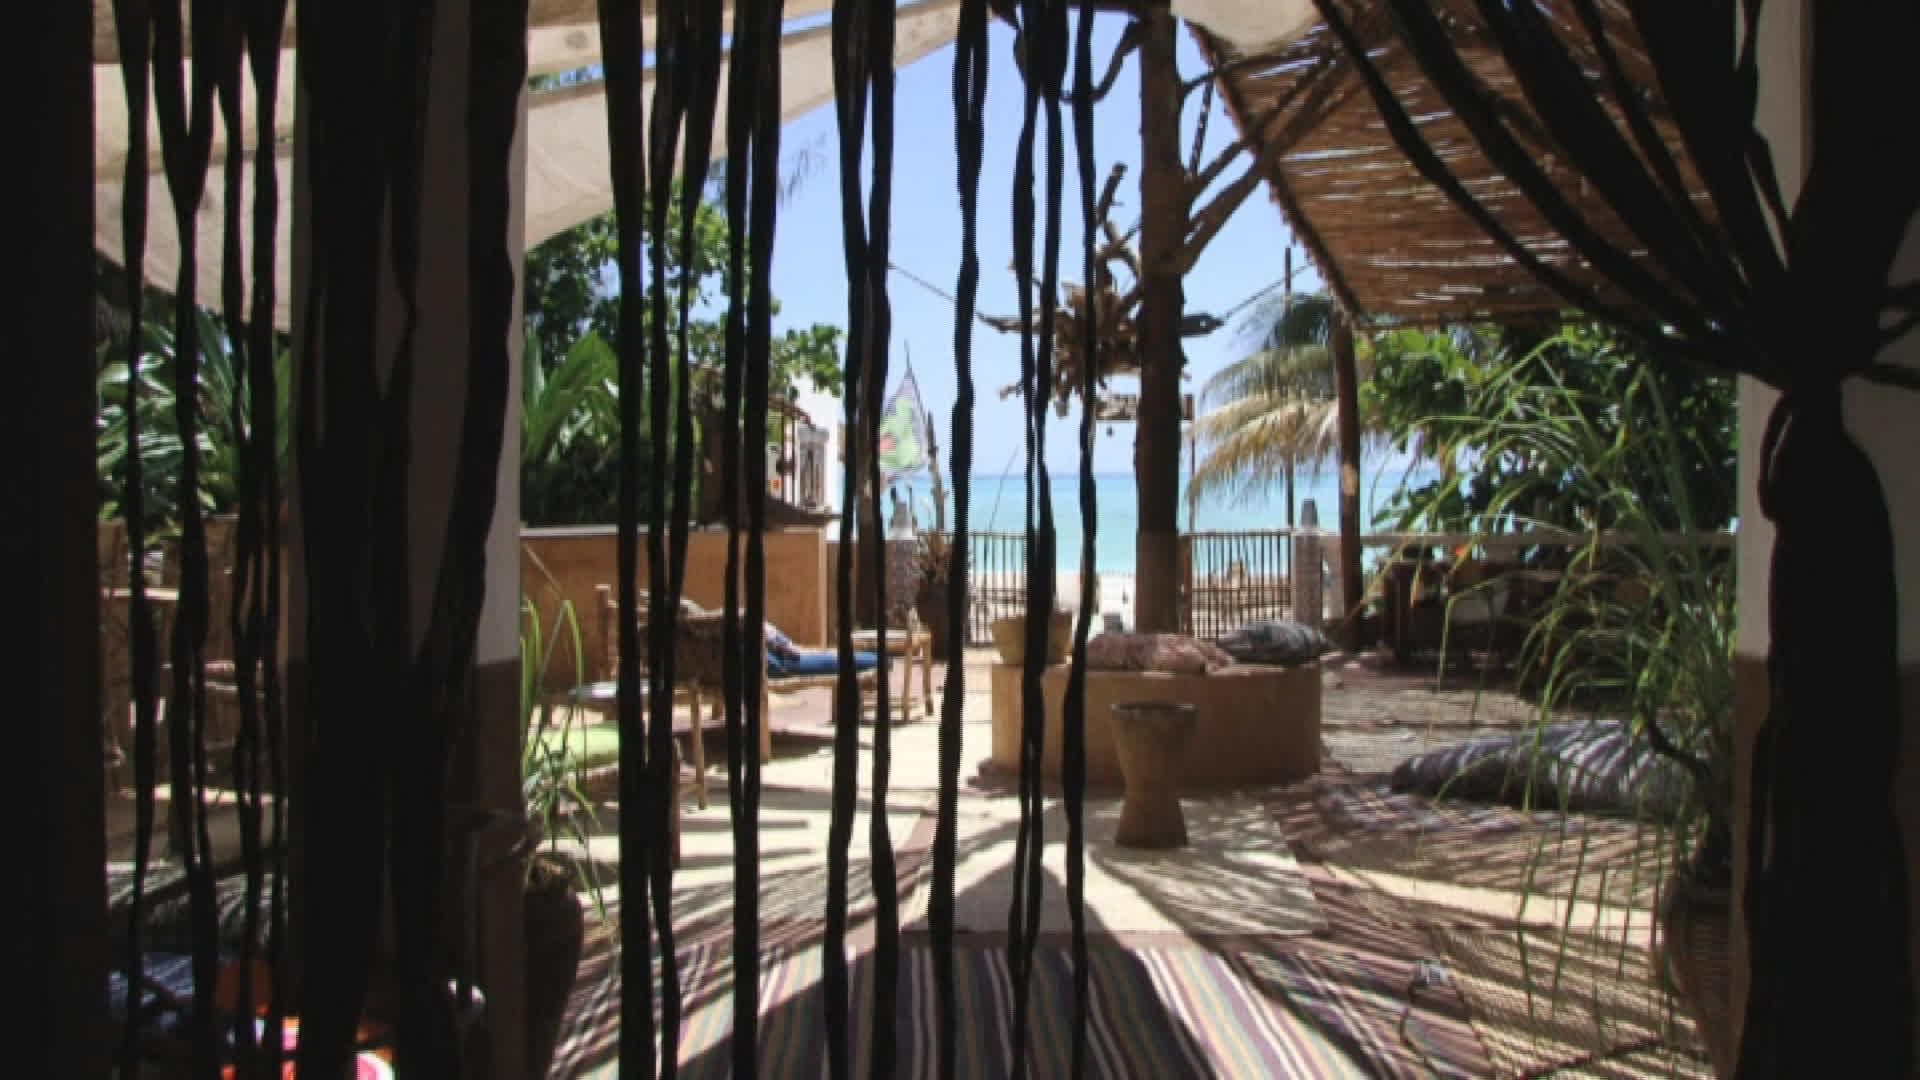 La maison Harakakite sur l'île de Zanzibar (Tanzanie)